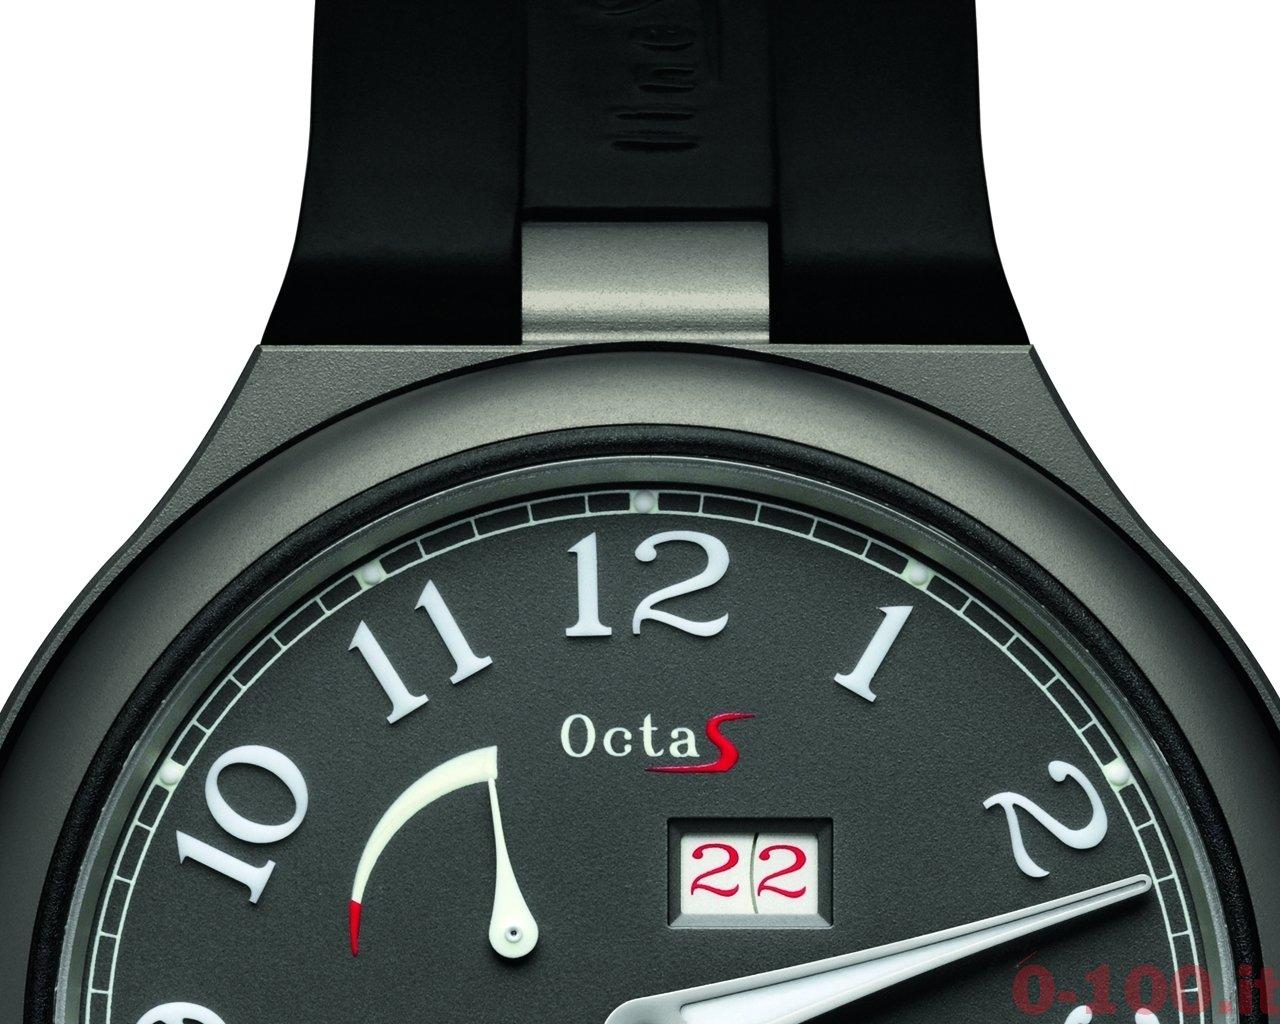 f-p-journe-octa-sport-titanium-prezzo-price-0-100_9